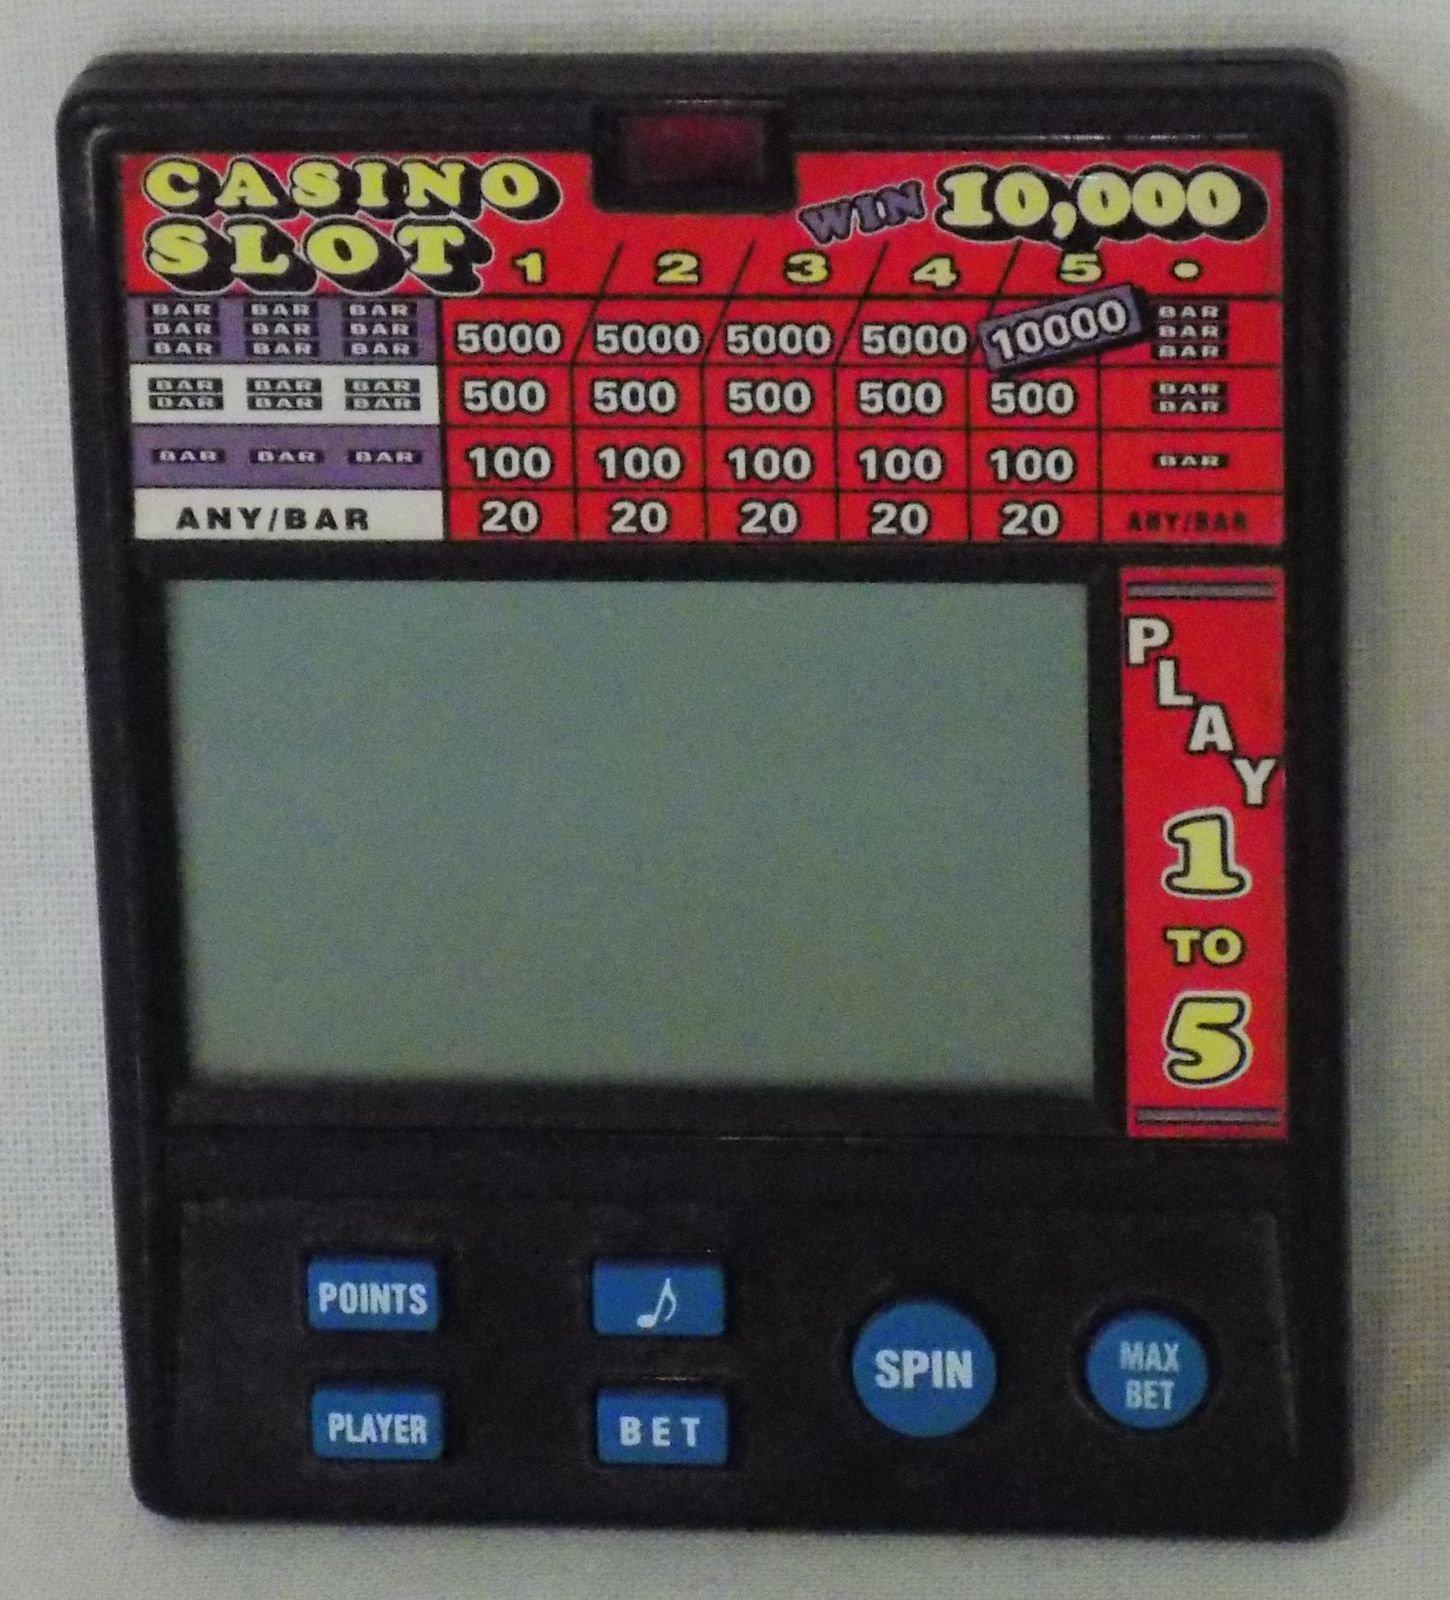 Radica Casino Slot 10,000 Electronic Hand Held Game #1470